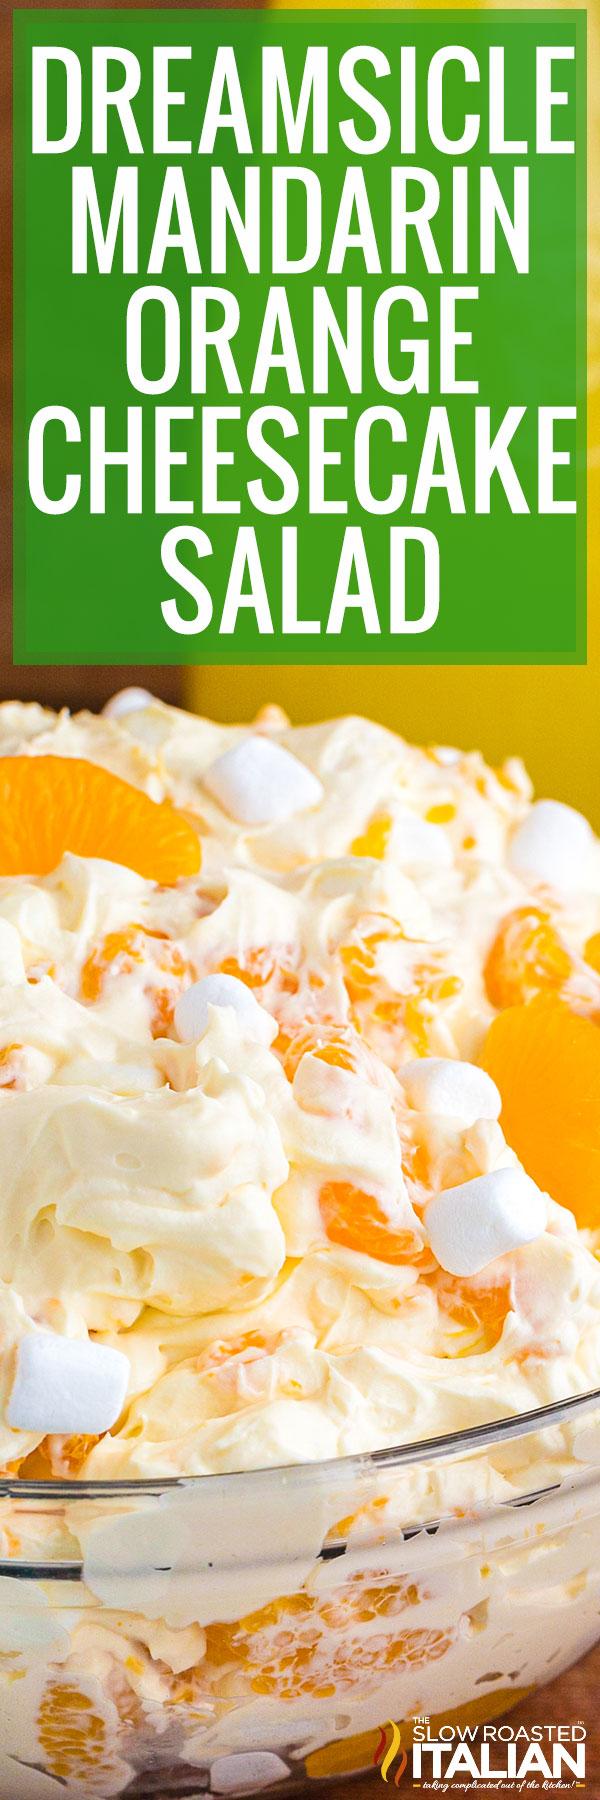 Dreamsicle Mandarin Orange Salad